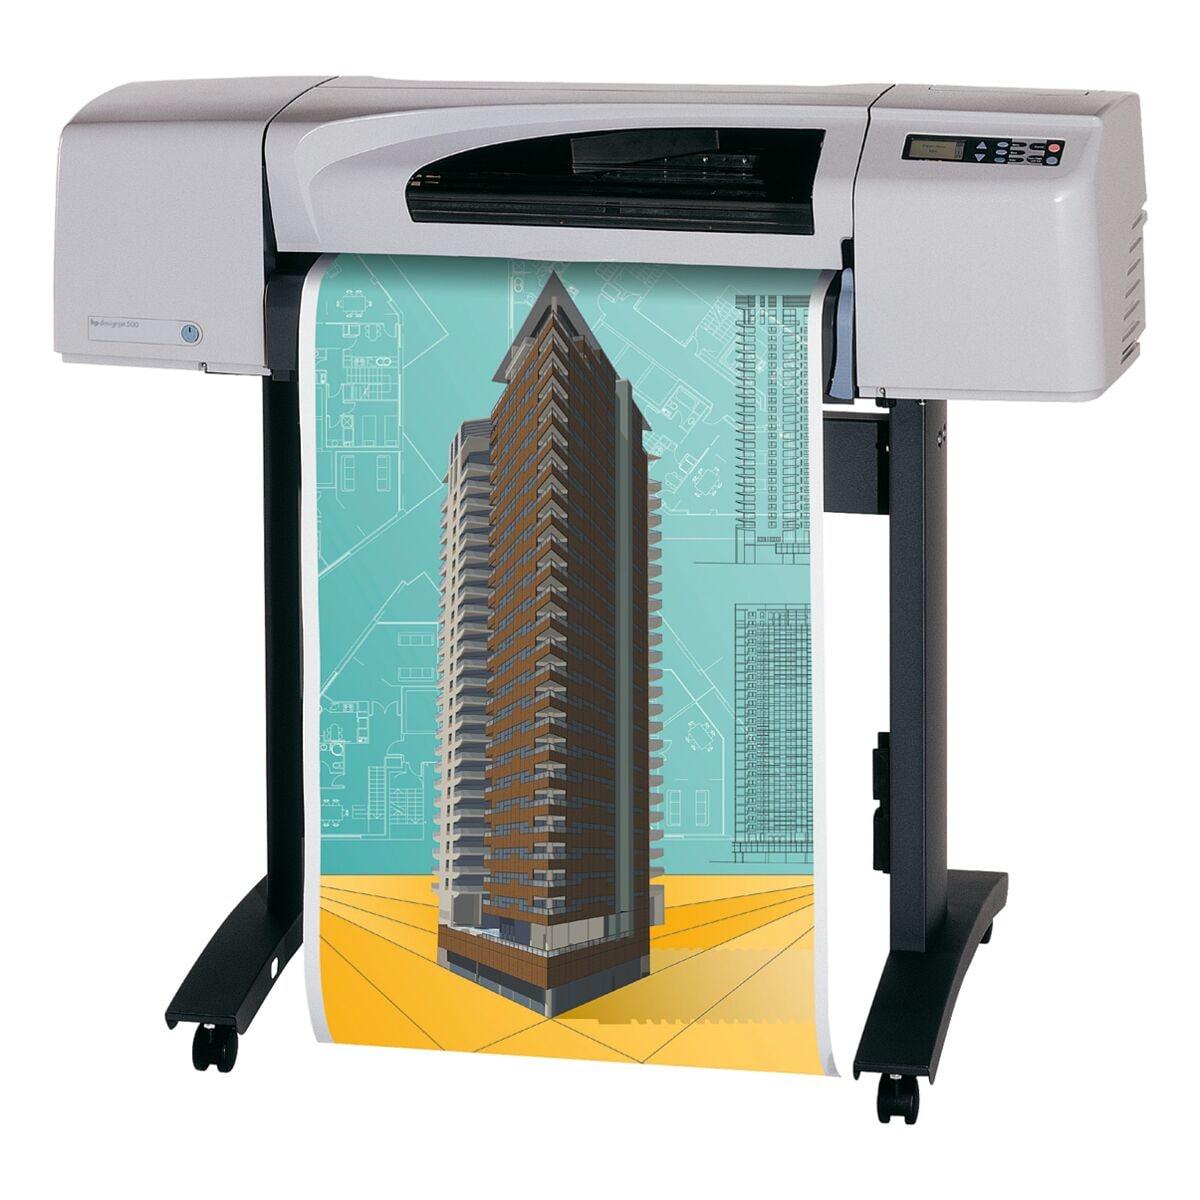 Inapa tecno cad Plotter-Papier »CAD Economics« 80 g/m² 914 mm x 50 m